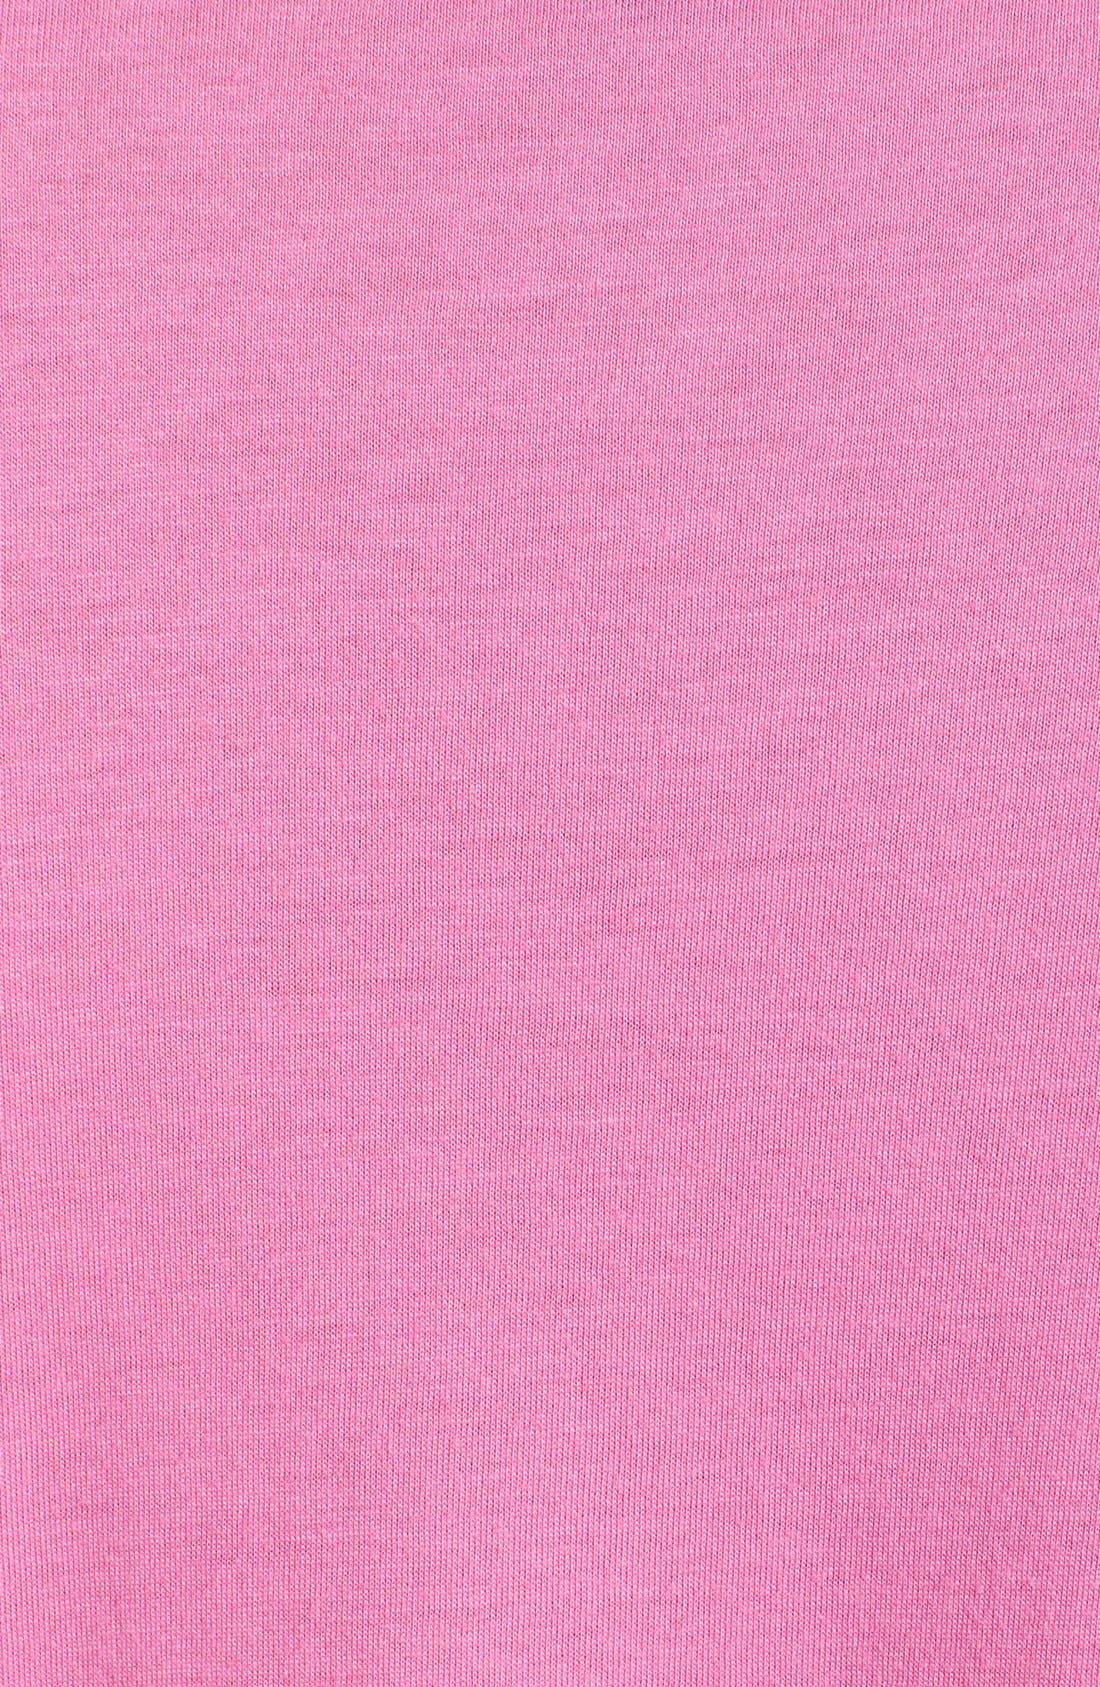 Knit Pajamas,                             Alternate thumbnail 3, color,                             Portofino Pink